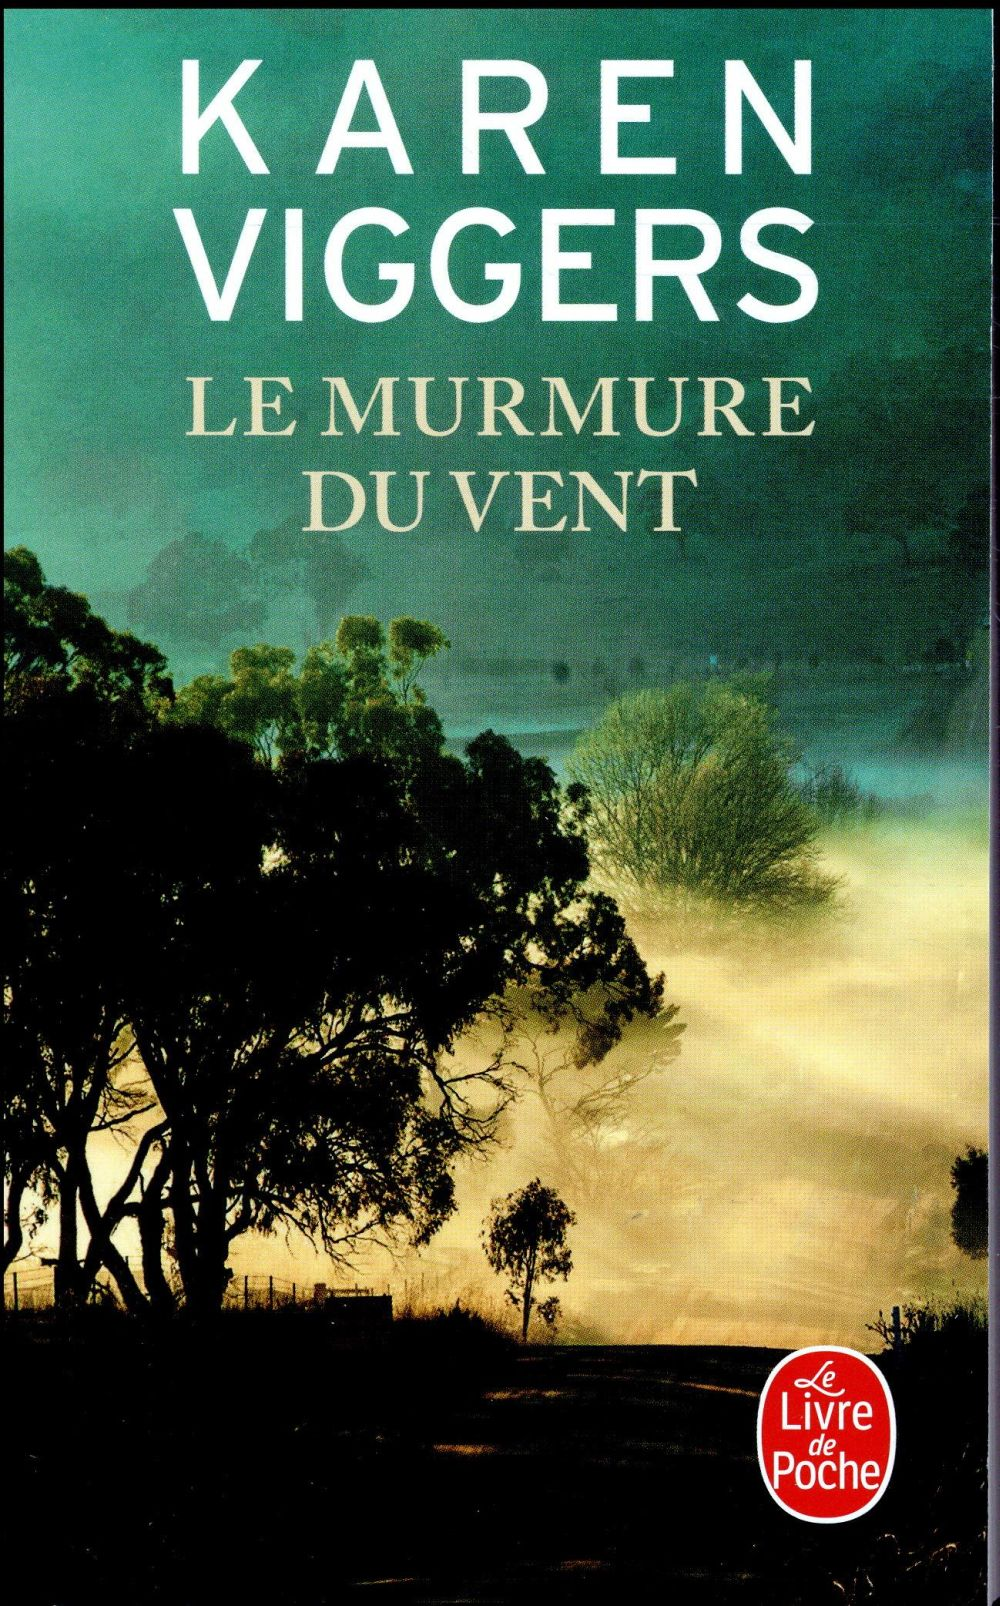 - LE MURMURE DU VENT